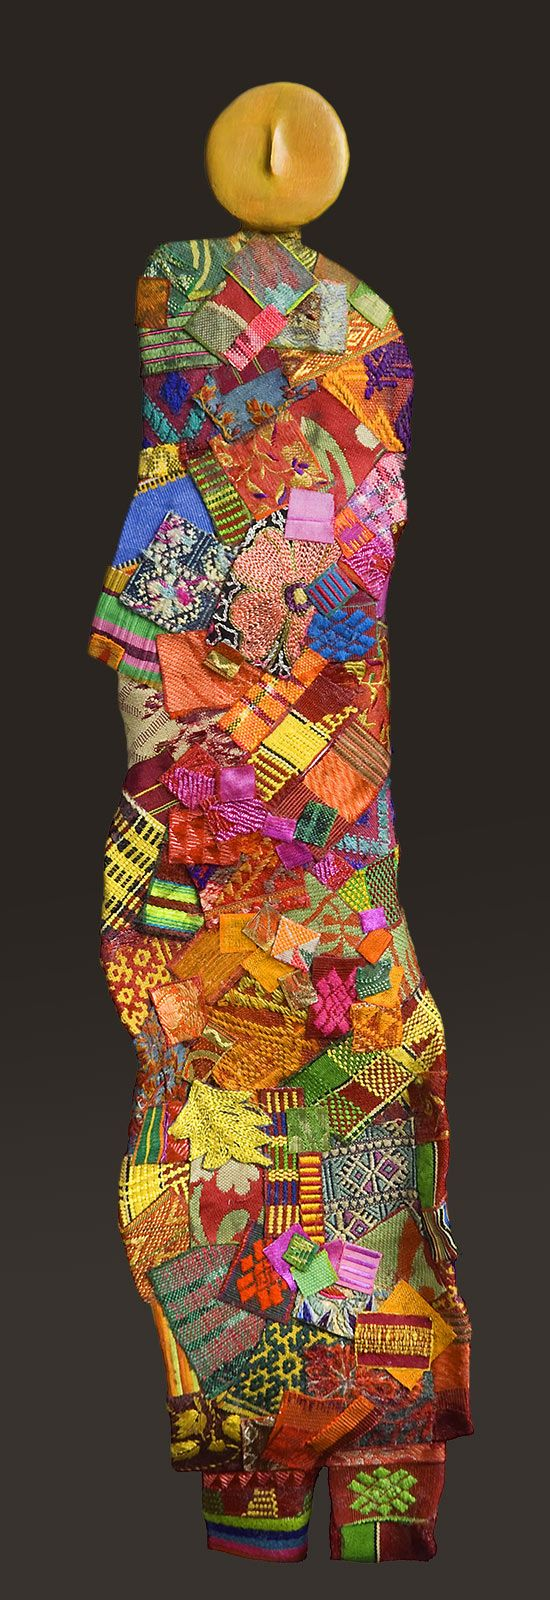 Georgette Benisty - Fiber Artist - Wall Sculpture